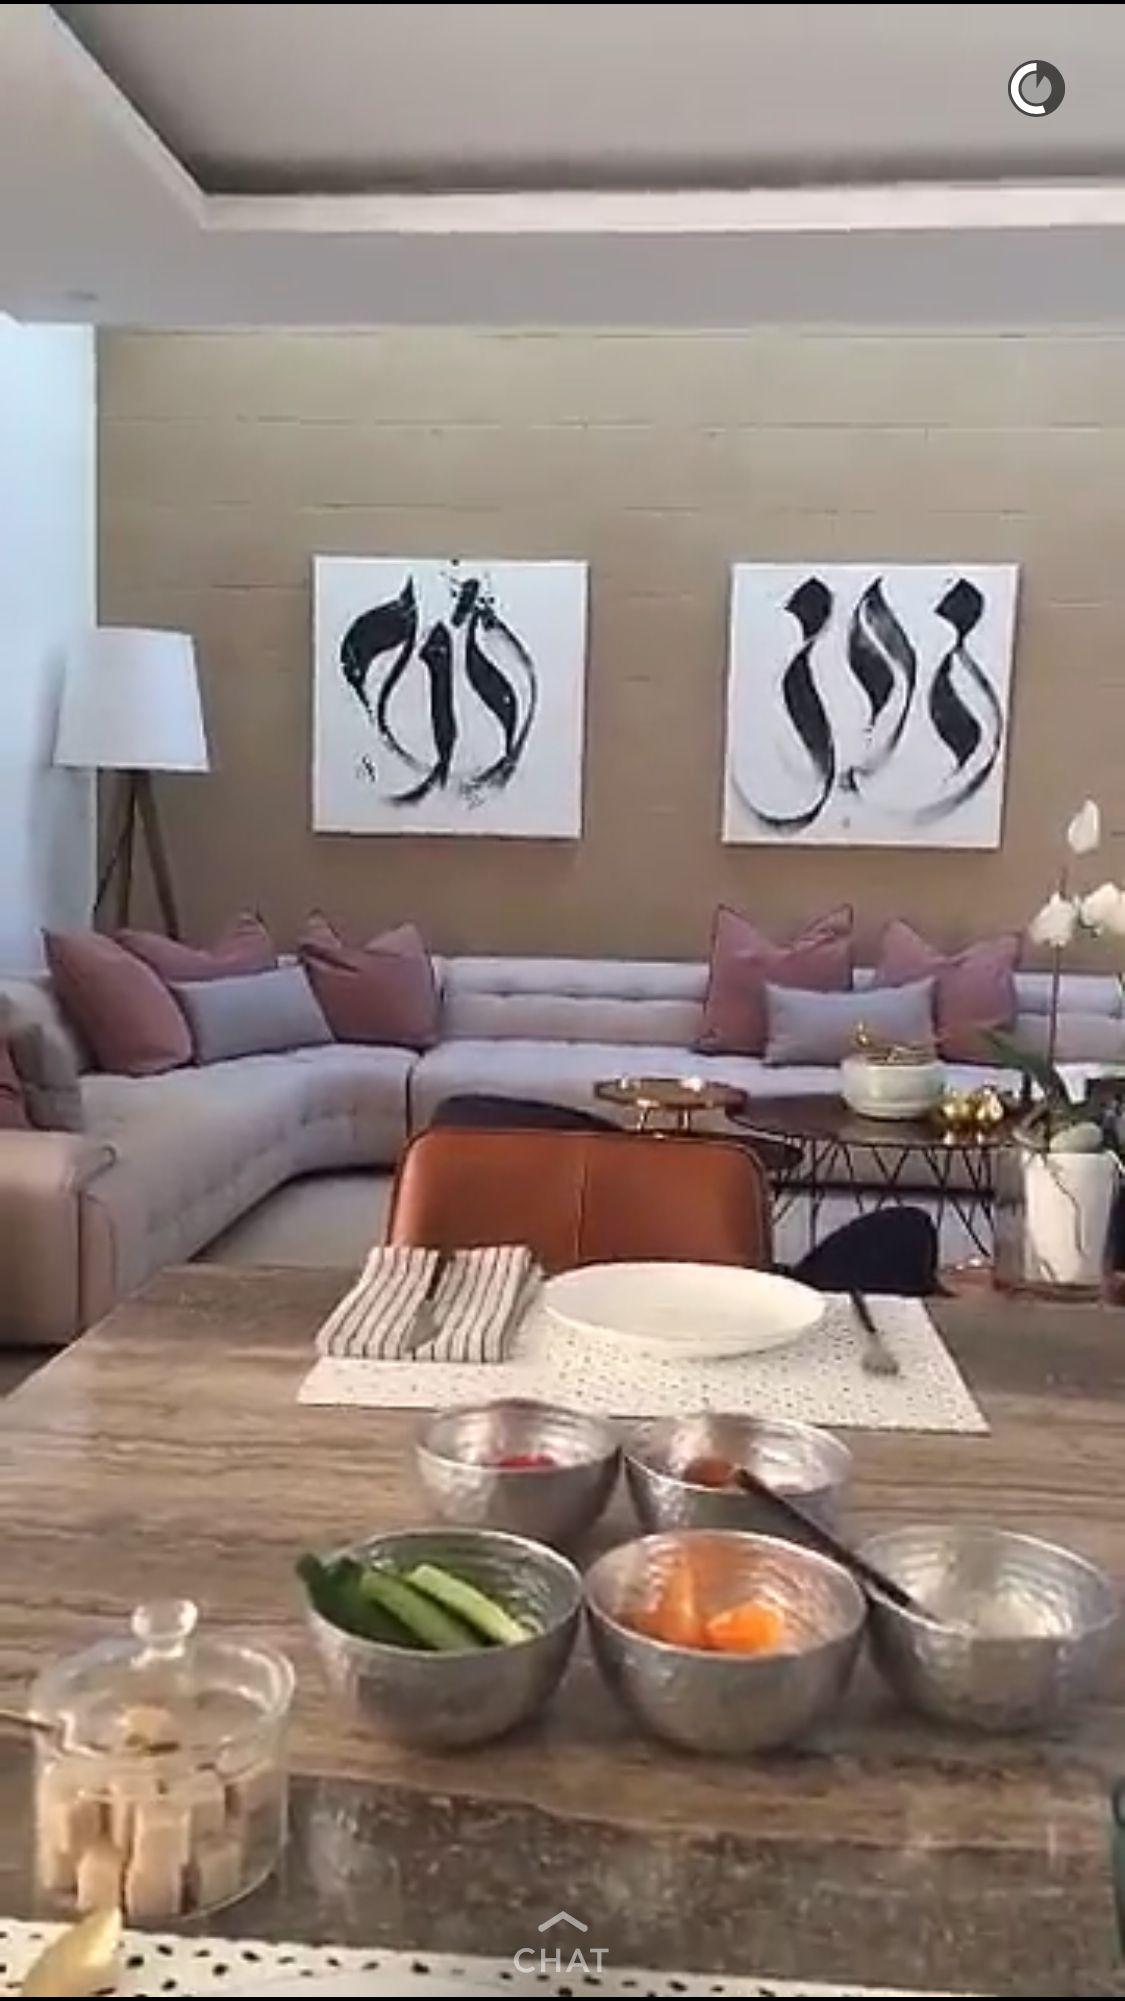 Color Combination Farah Alhumaidhis House White Walls Living Room Room Decor Living Room Wall